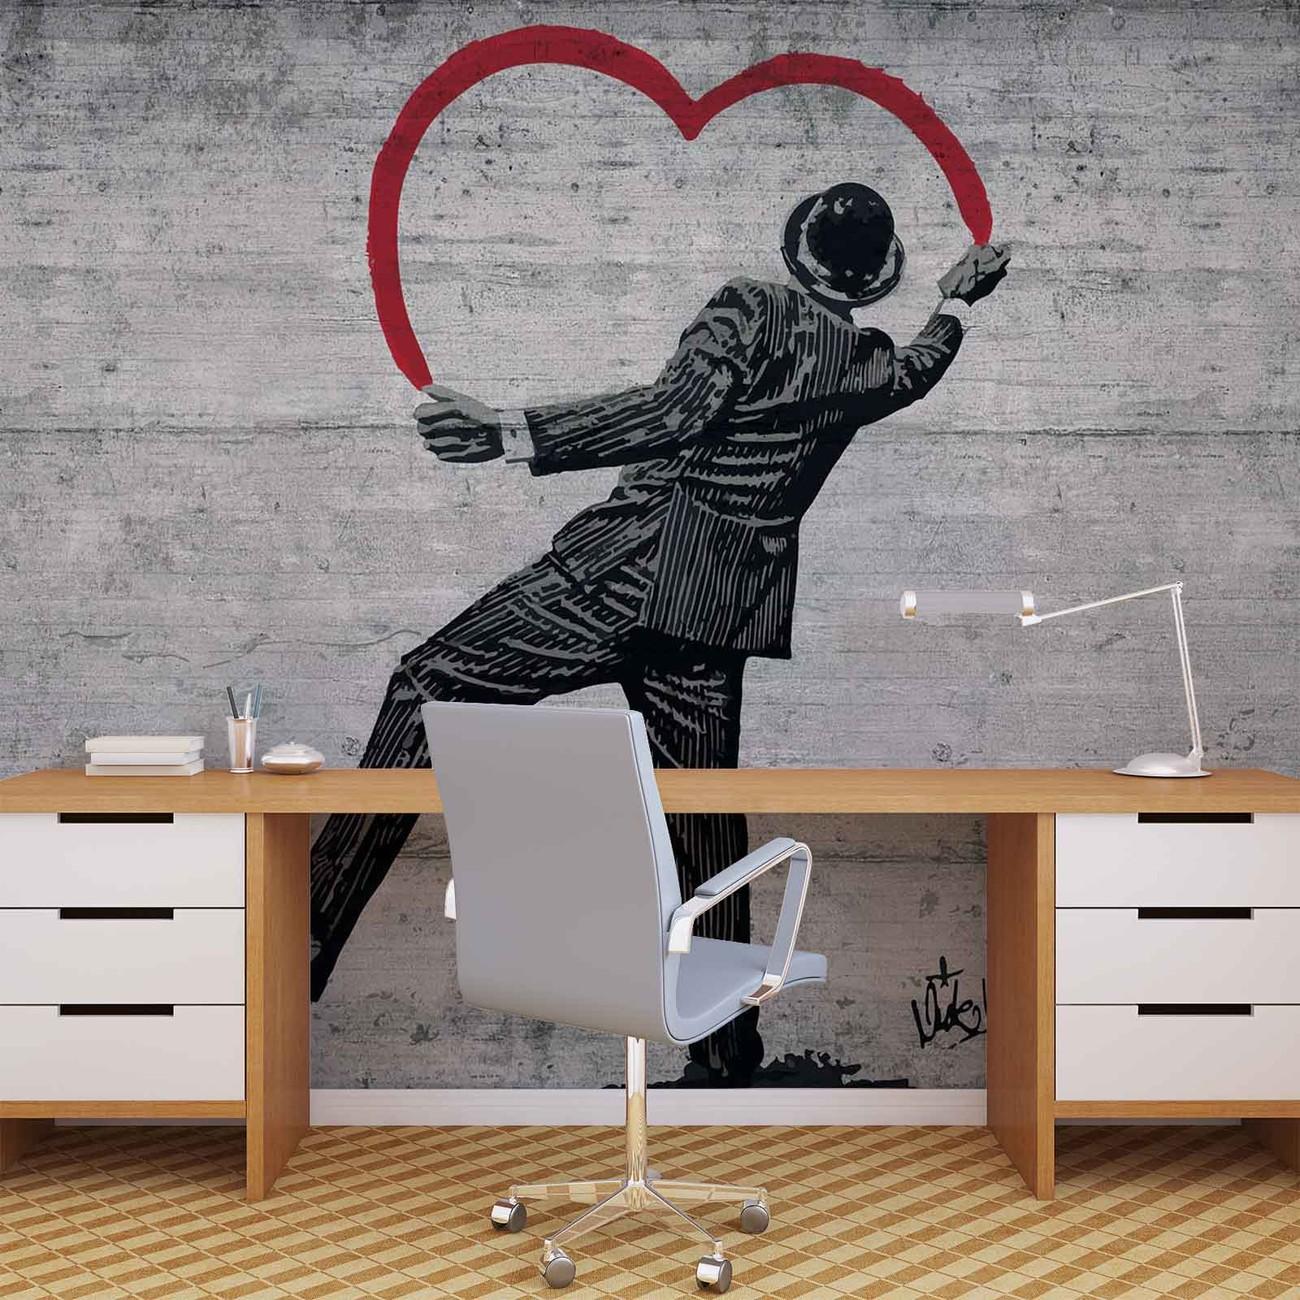 Banksy Graffiti Concrete Wall Wall Paper Mural